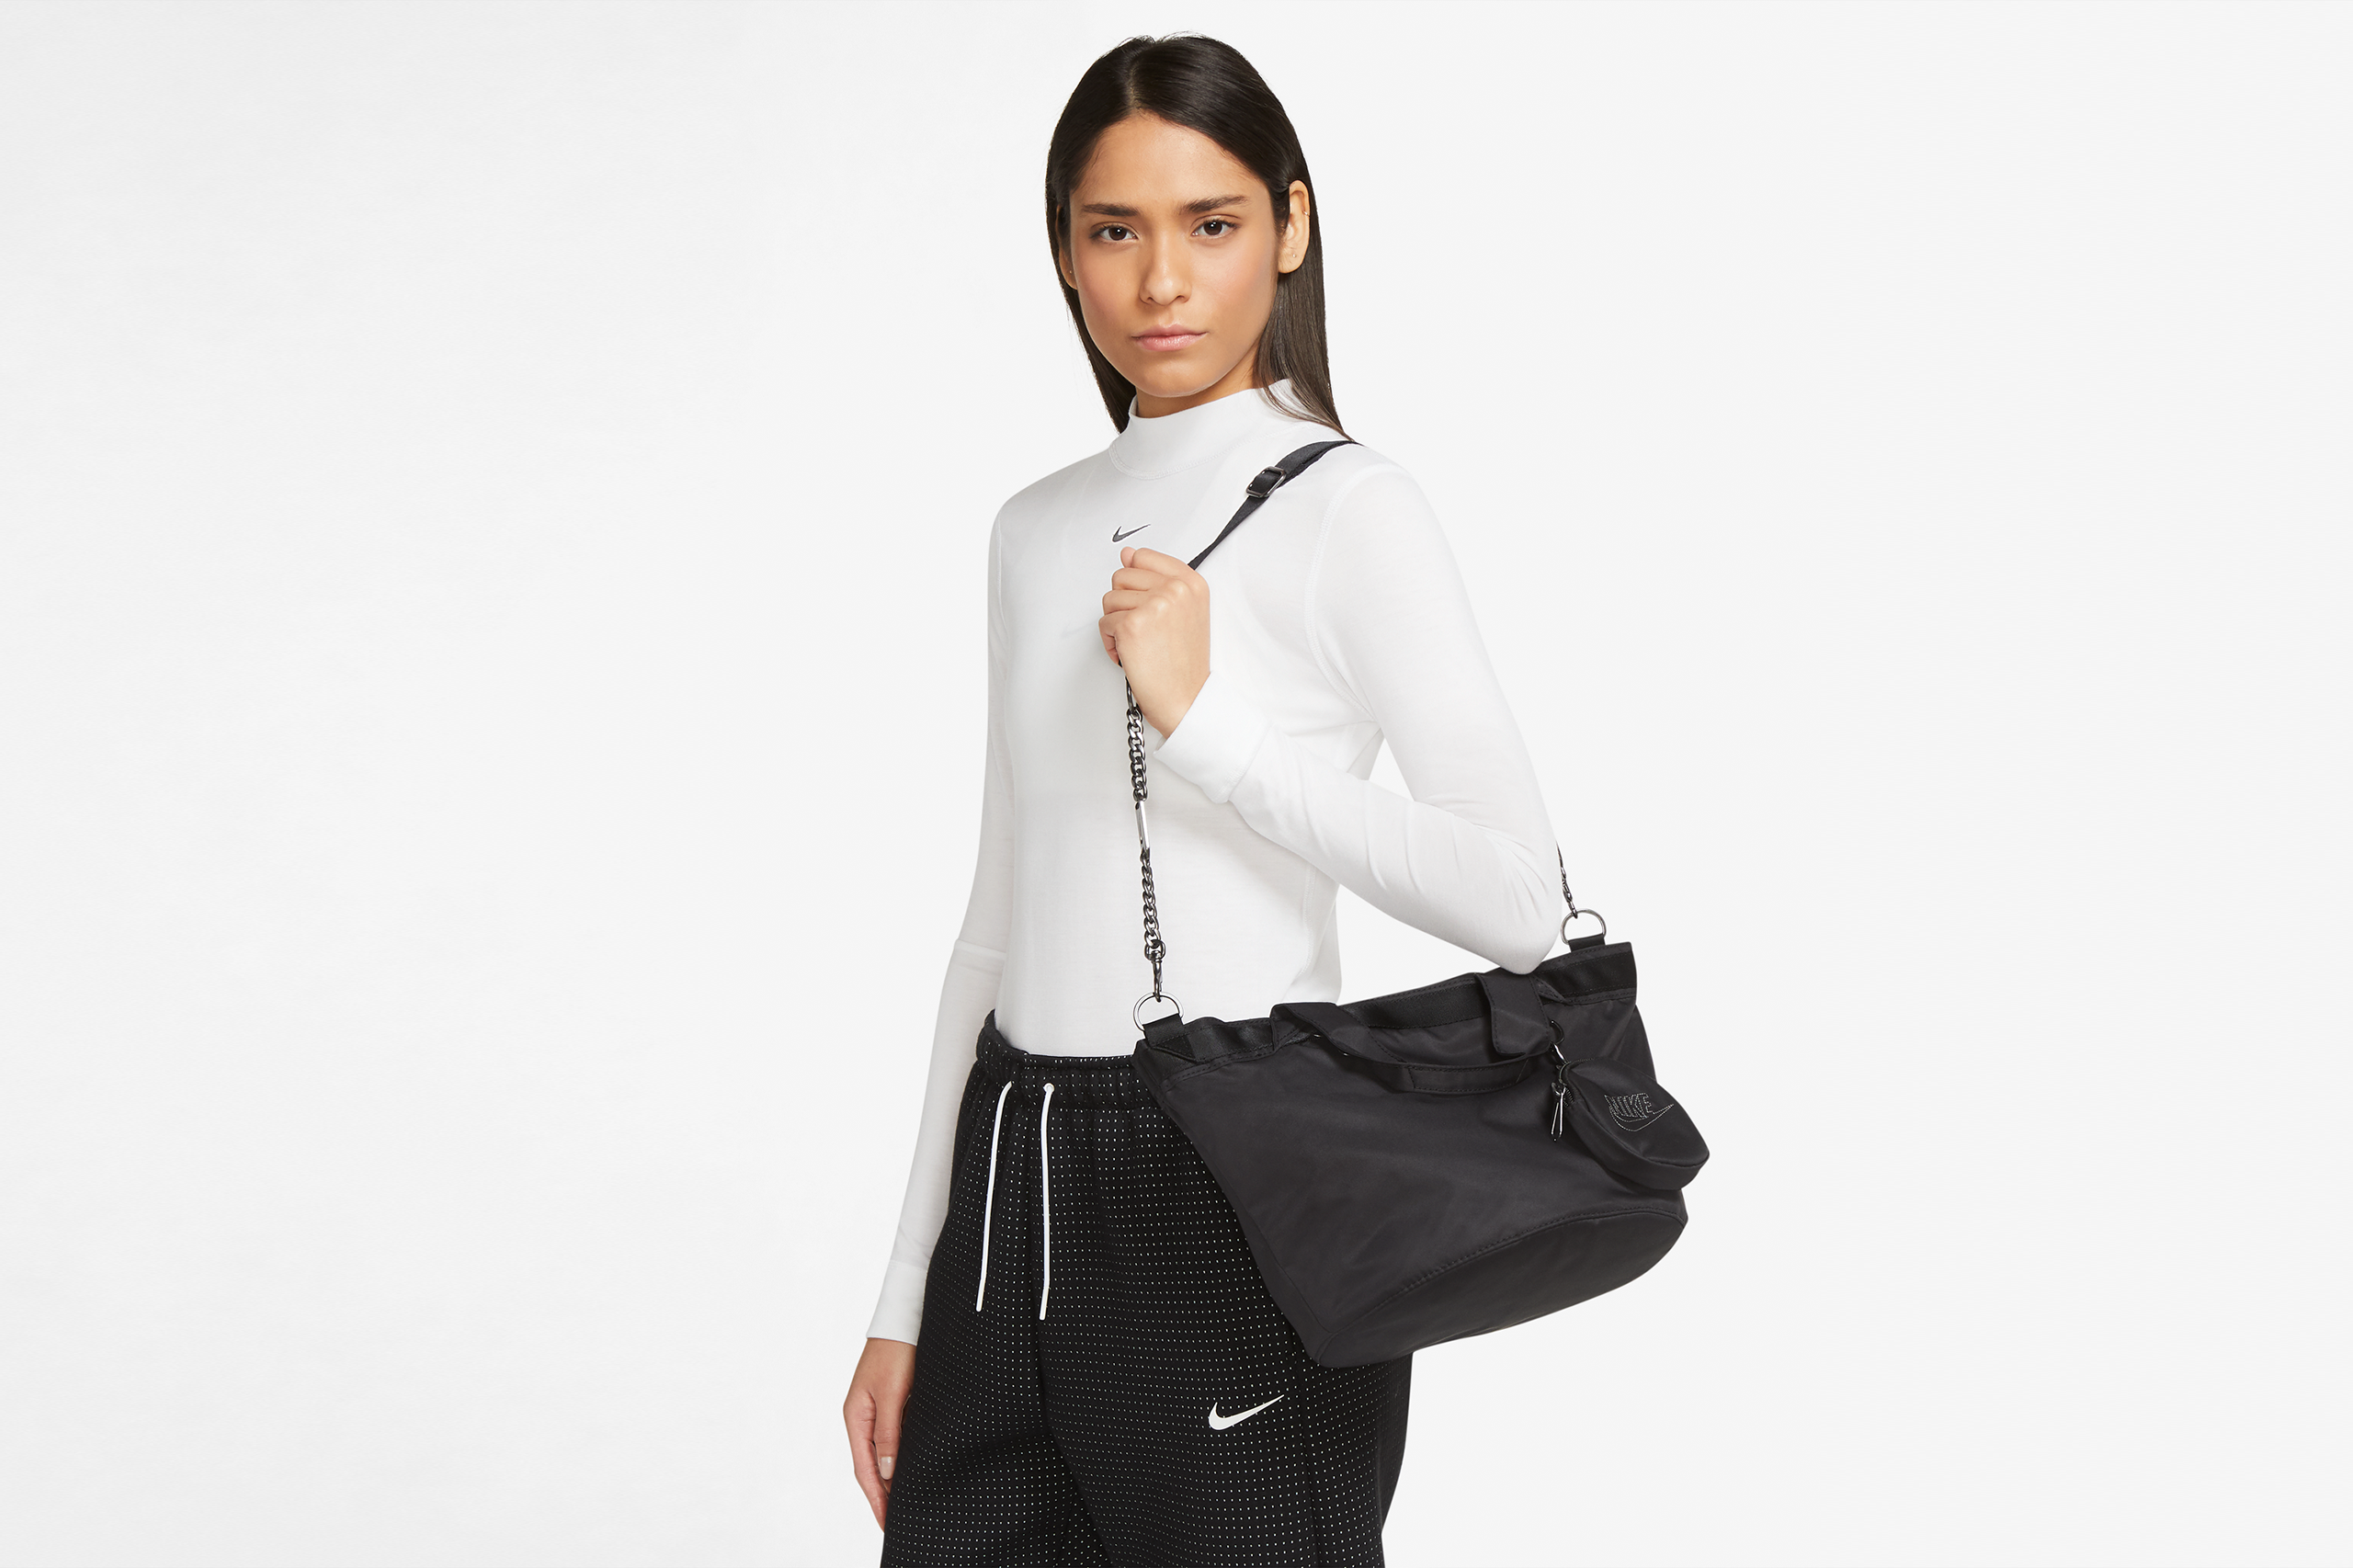 Nike Women's Futura Luxe Tote Black / White